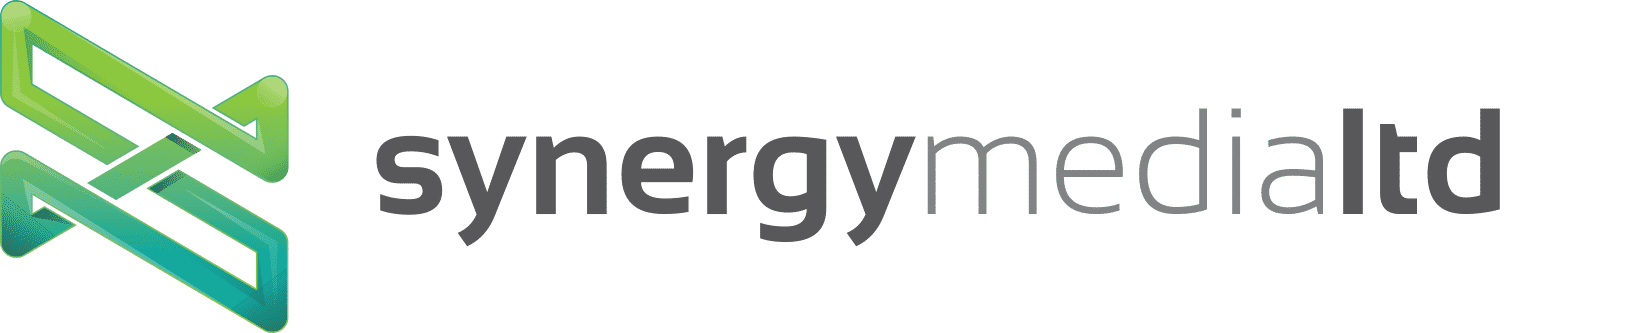 Synergy Media Ltd – Synergy Media Ltd